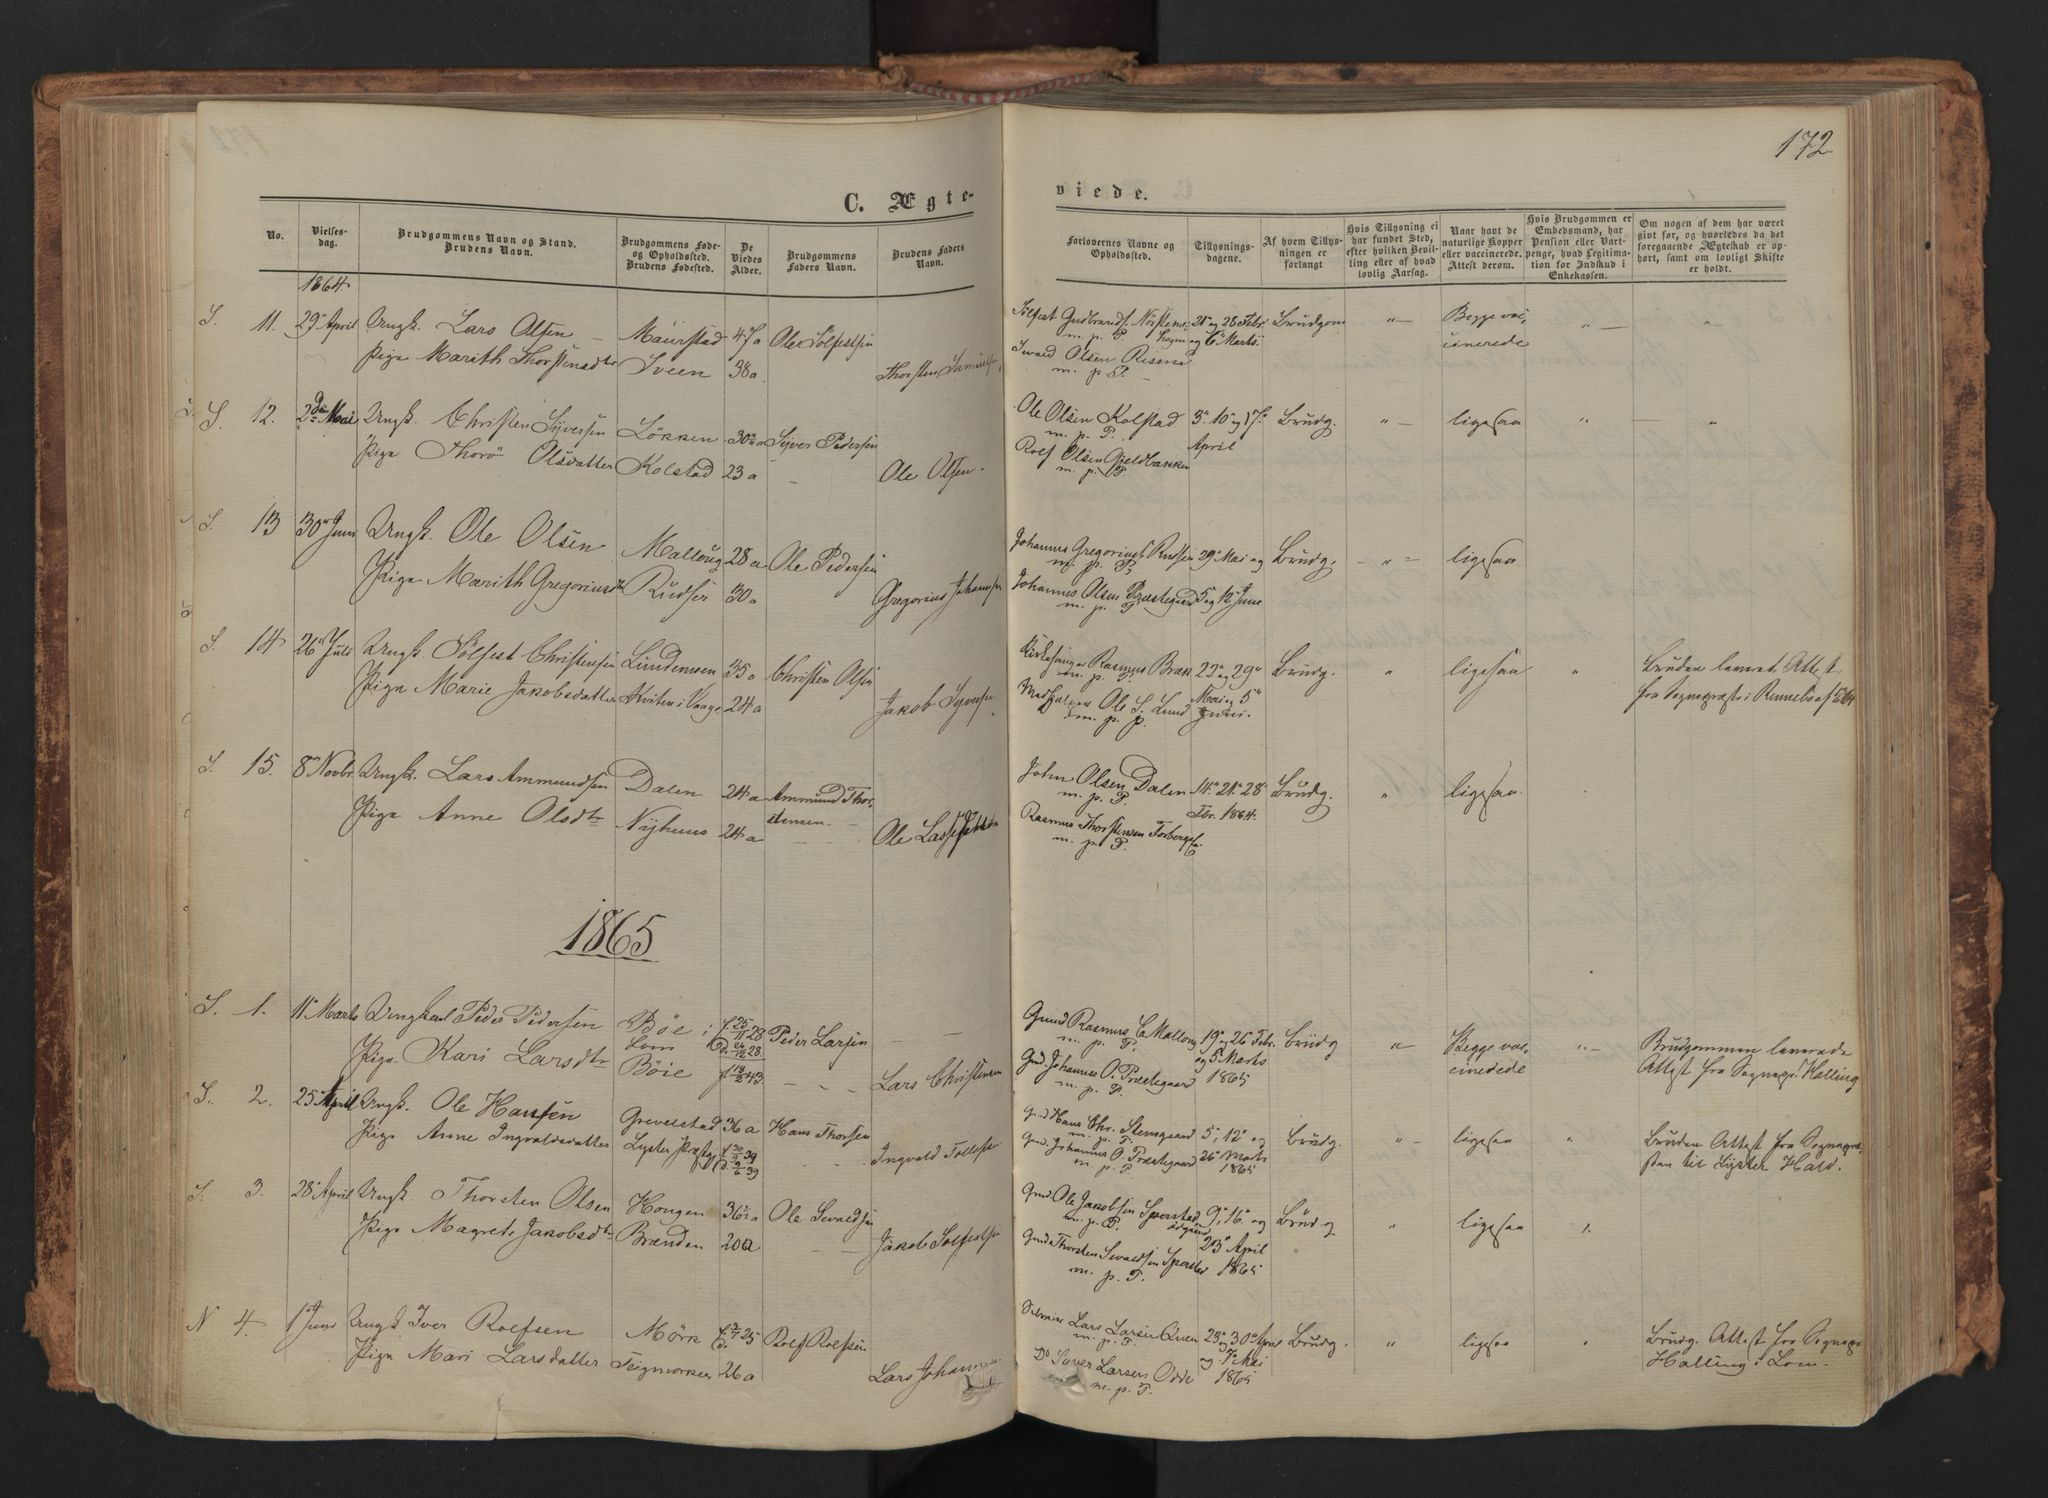 SAH, Skjåk prestekontor, Ministerialbok nr. 1, 1863-1879, s. 172